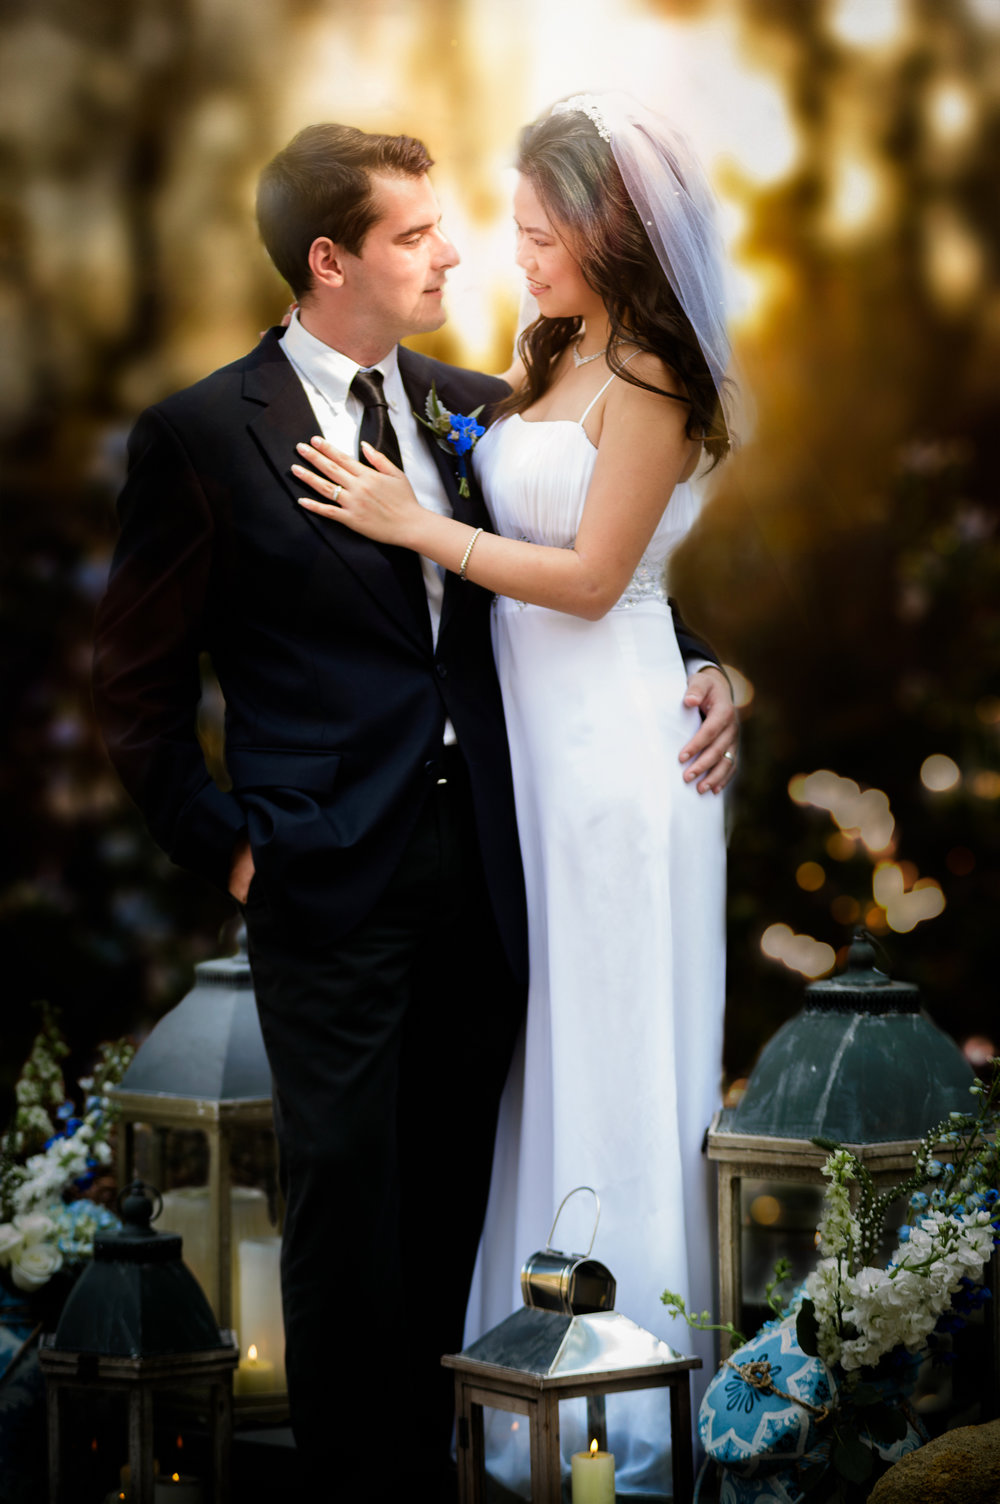 wedding_portrait-3.jpg